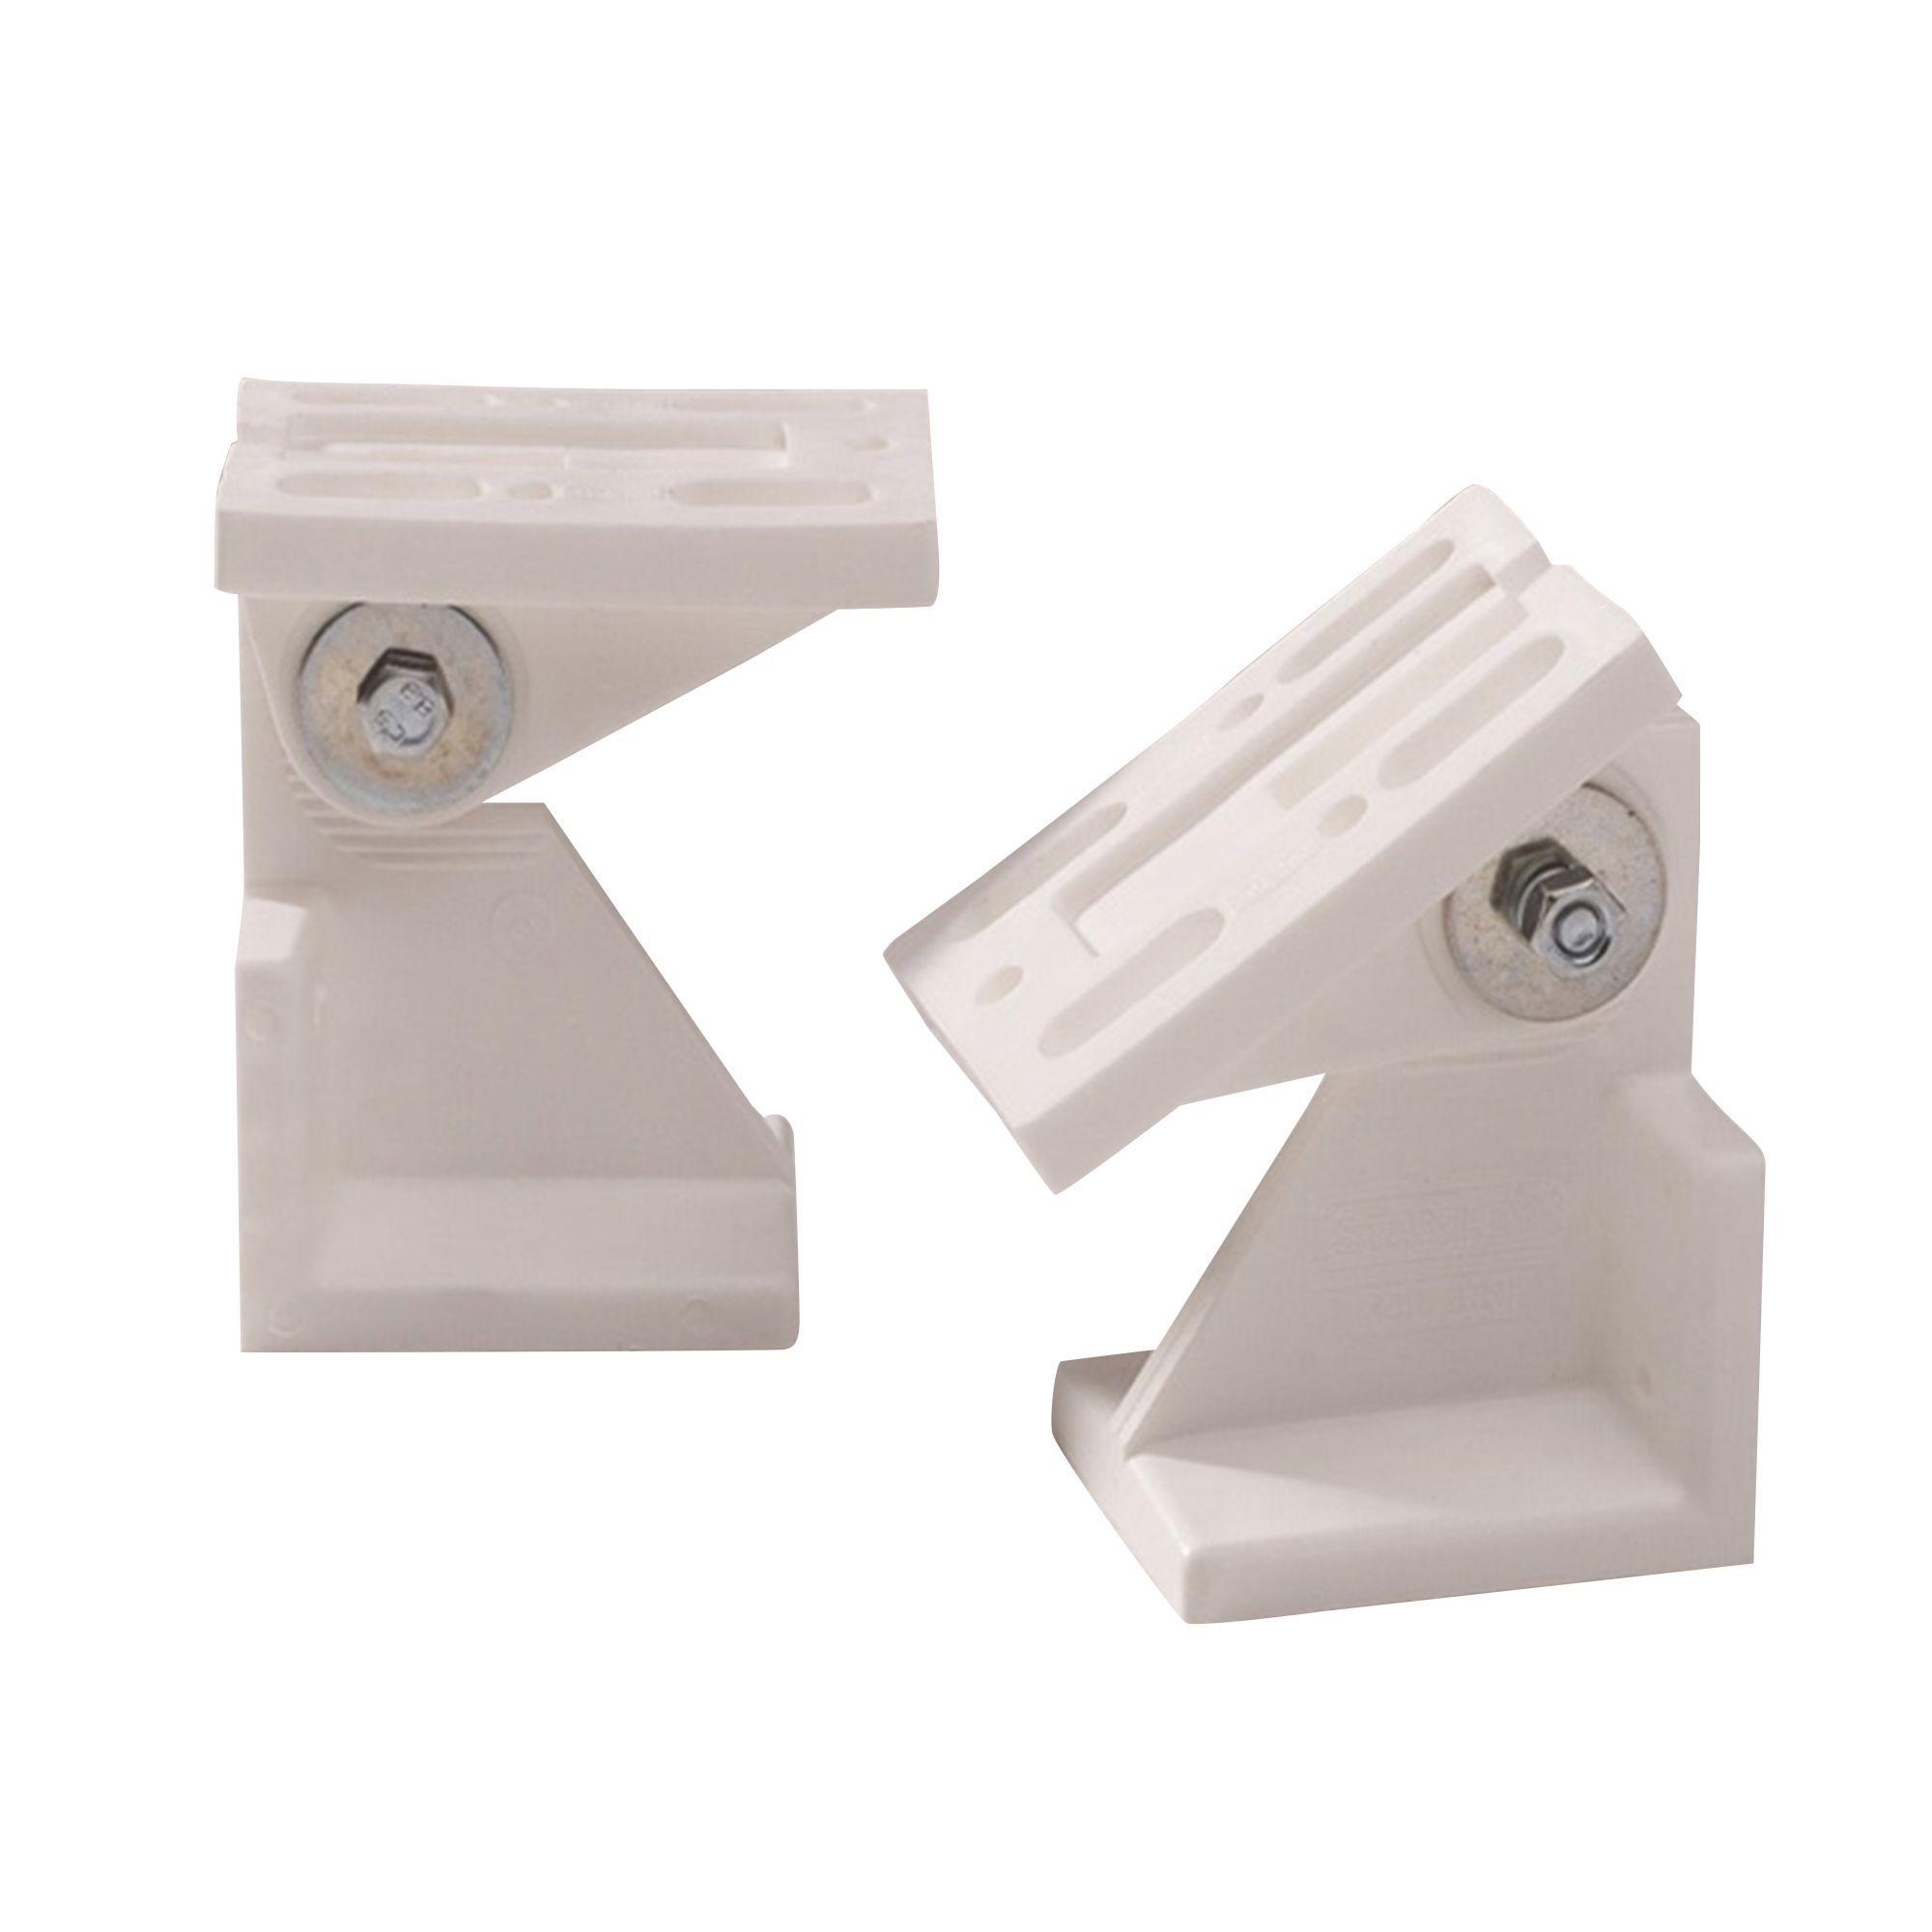 Form Plastic Angled Ceiling Bracket Departments Diy At B Q